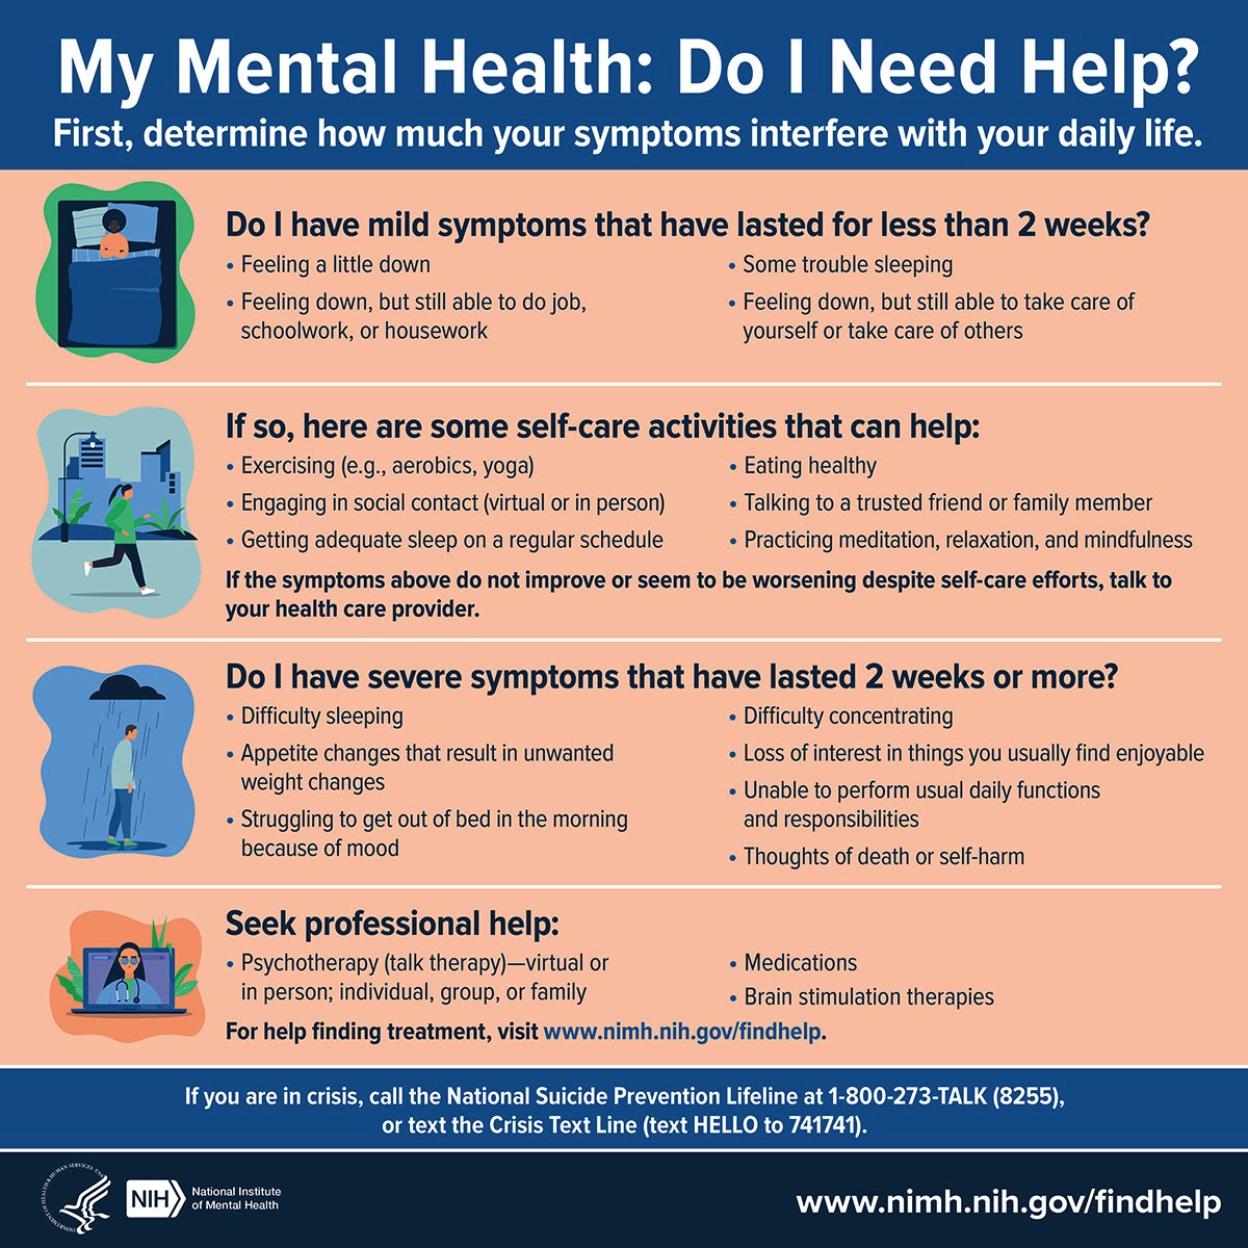 My Mental Health Fact Sheet